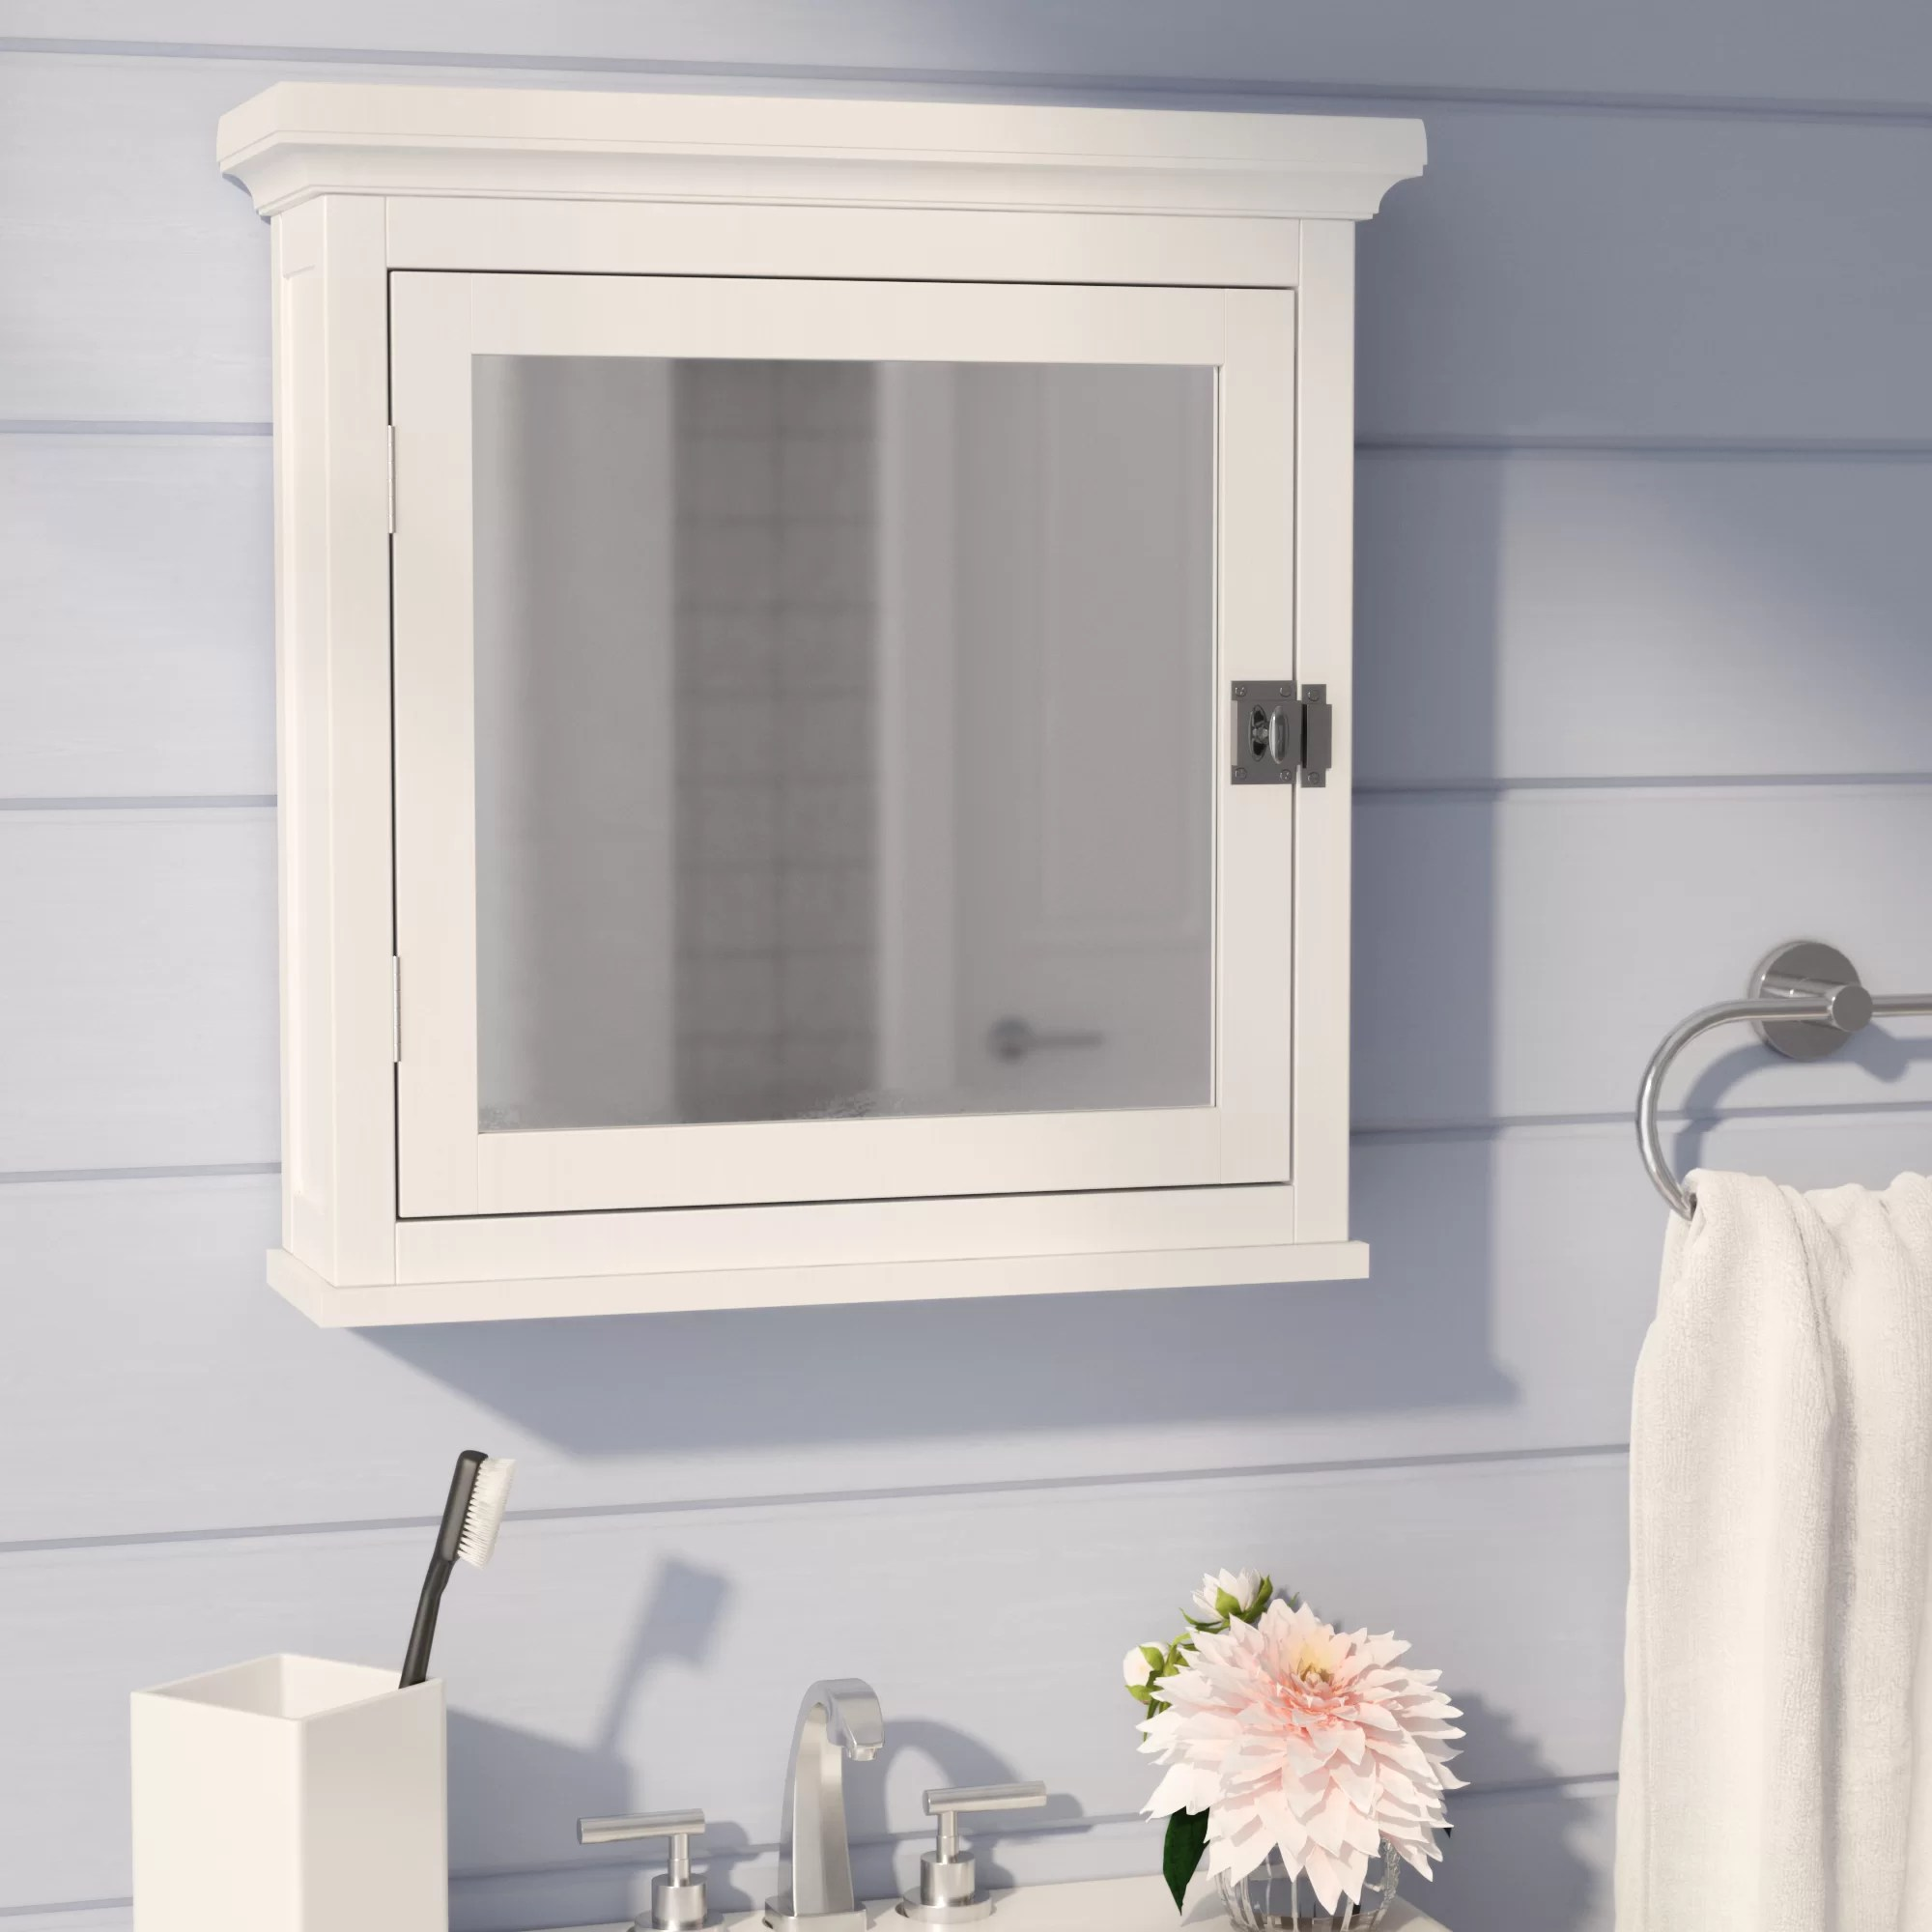 Beachcrest Home Sumter Surface Mount Medicine Cabinet